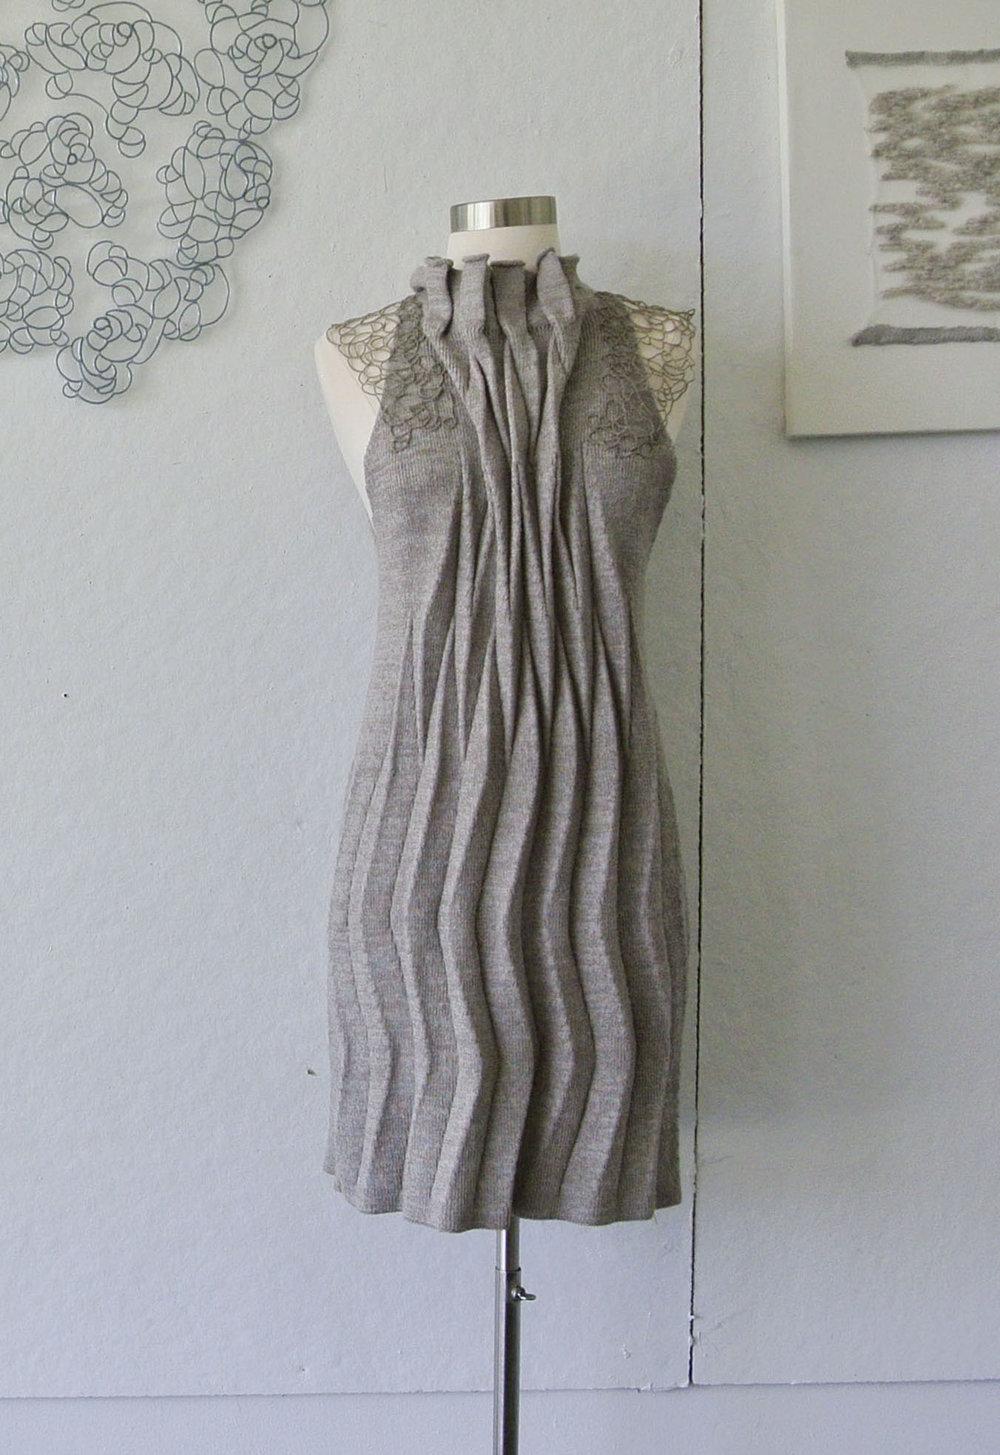 pleat dress on form.jpg